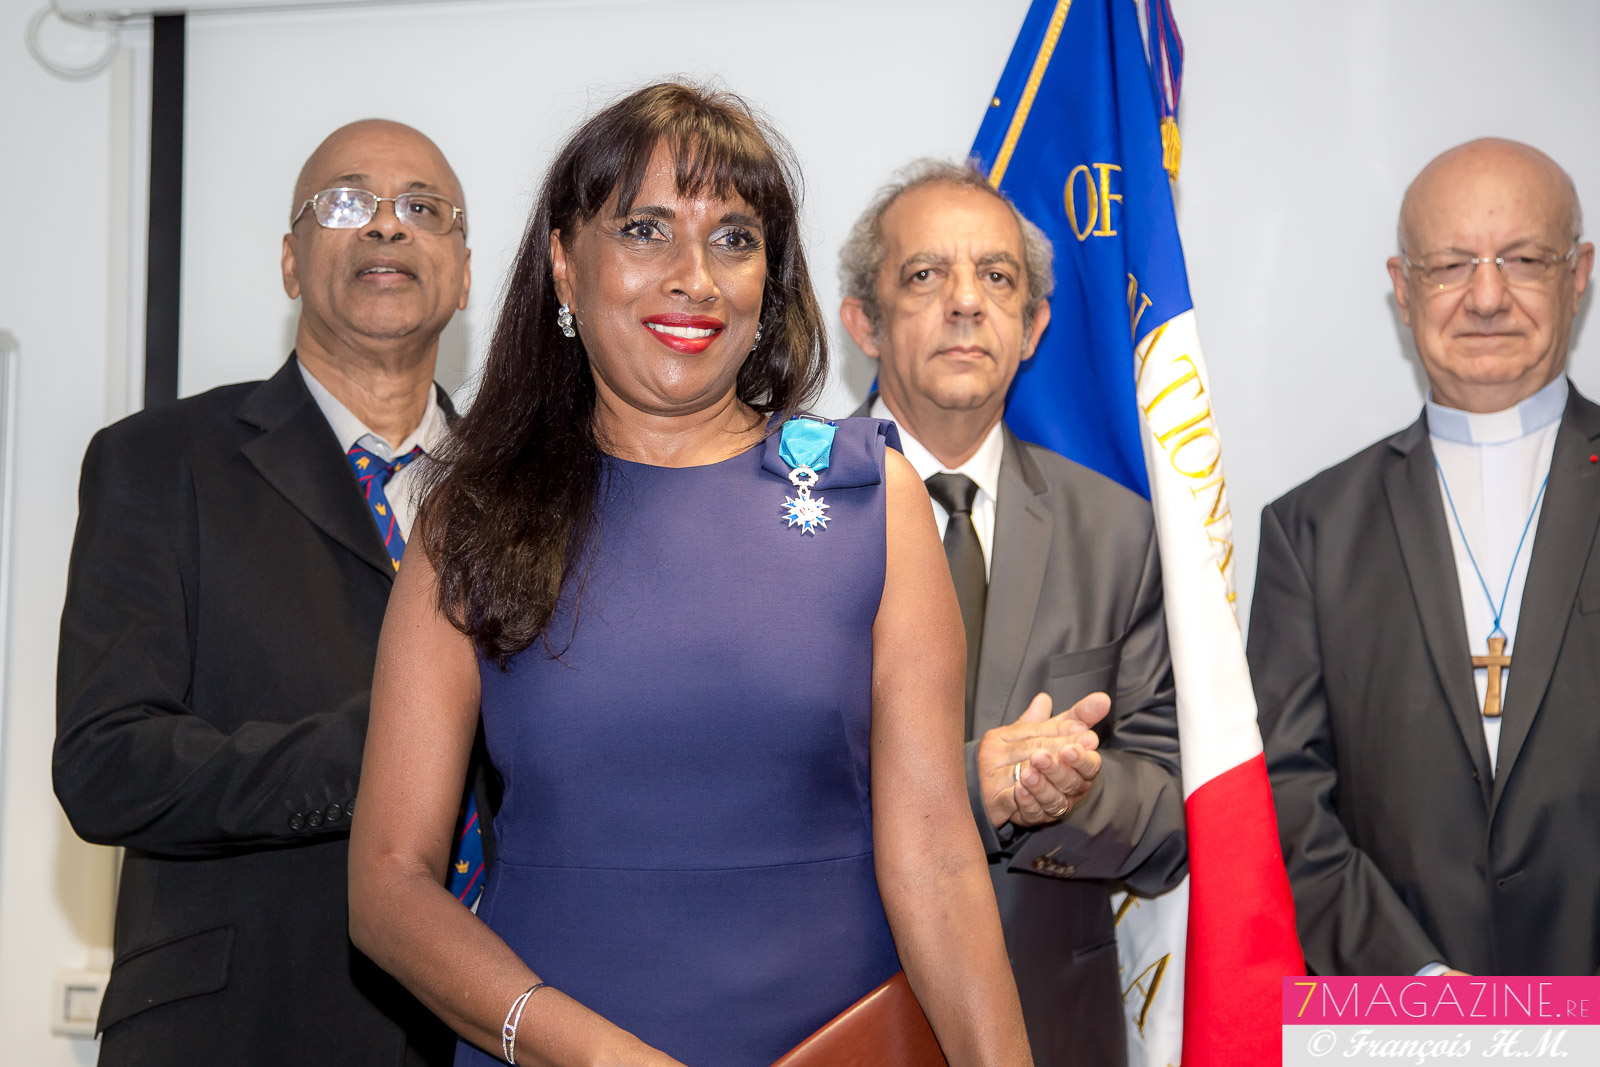 Ida Mag Camalon, Chevalier de l'Ordre National du Mérite